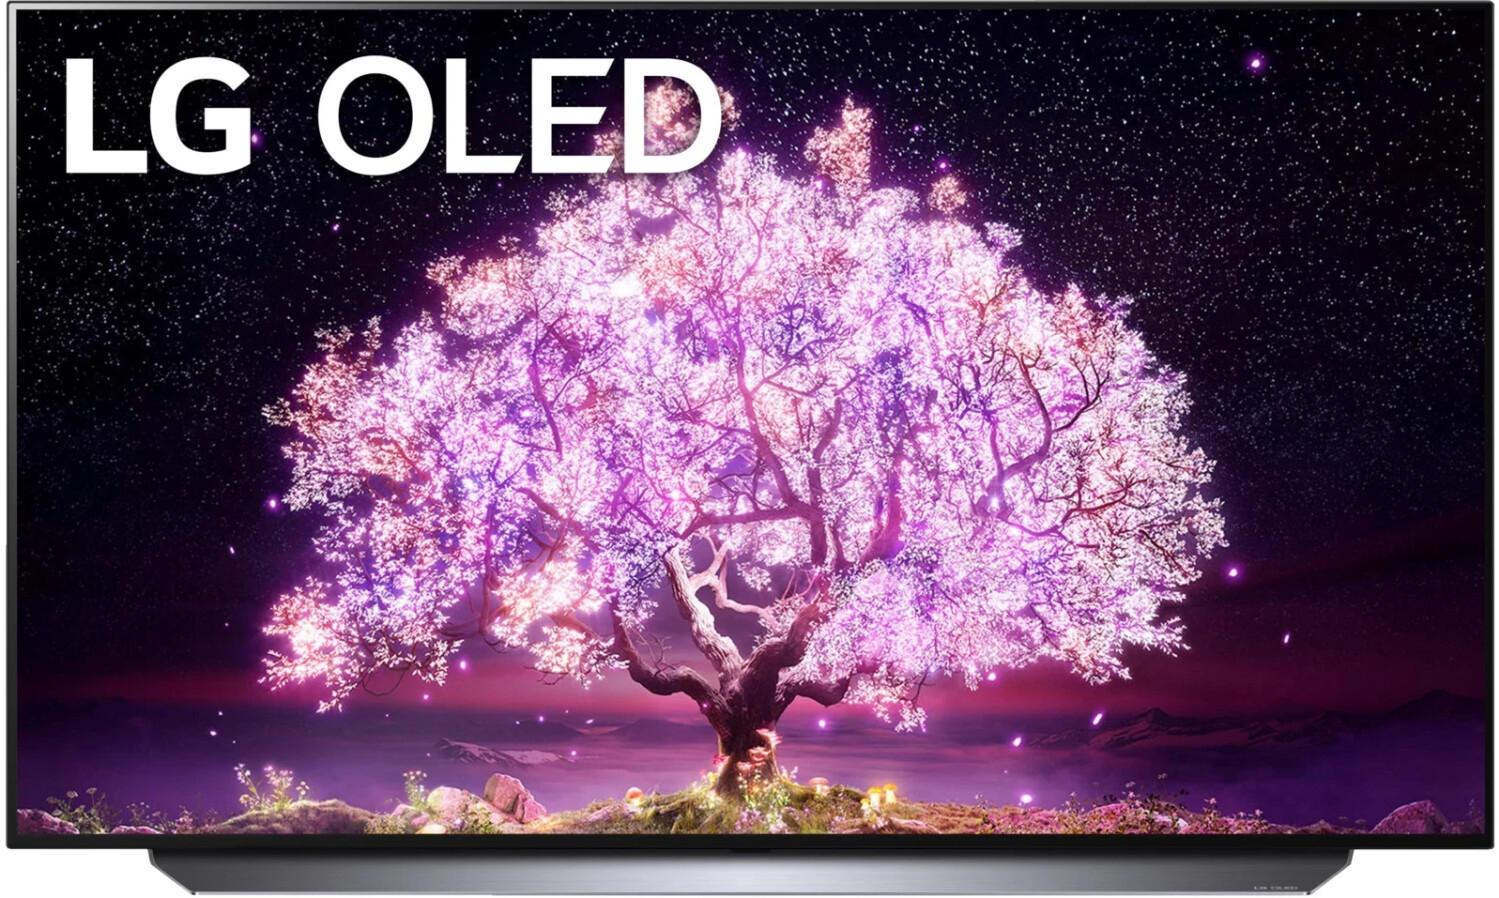 LG OLED55C17LB OLED TV 55 Zoll, 4K UHD, HDR, SmartTV, Twin Triple Tuner, Modell 2021